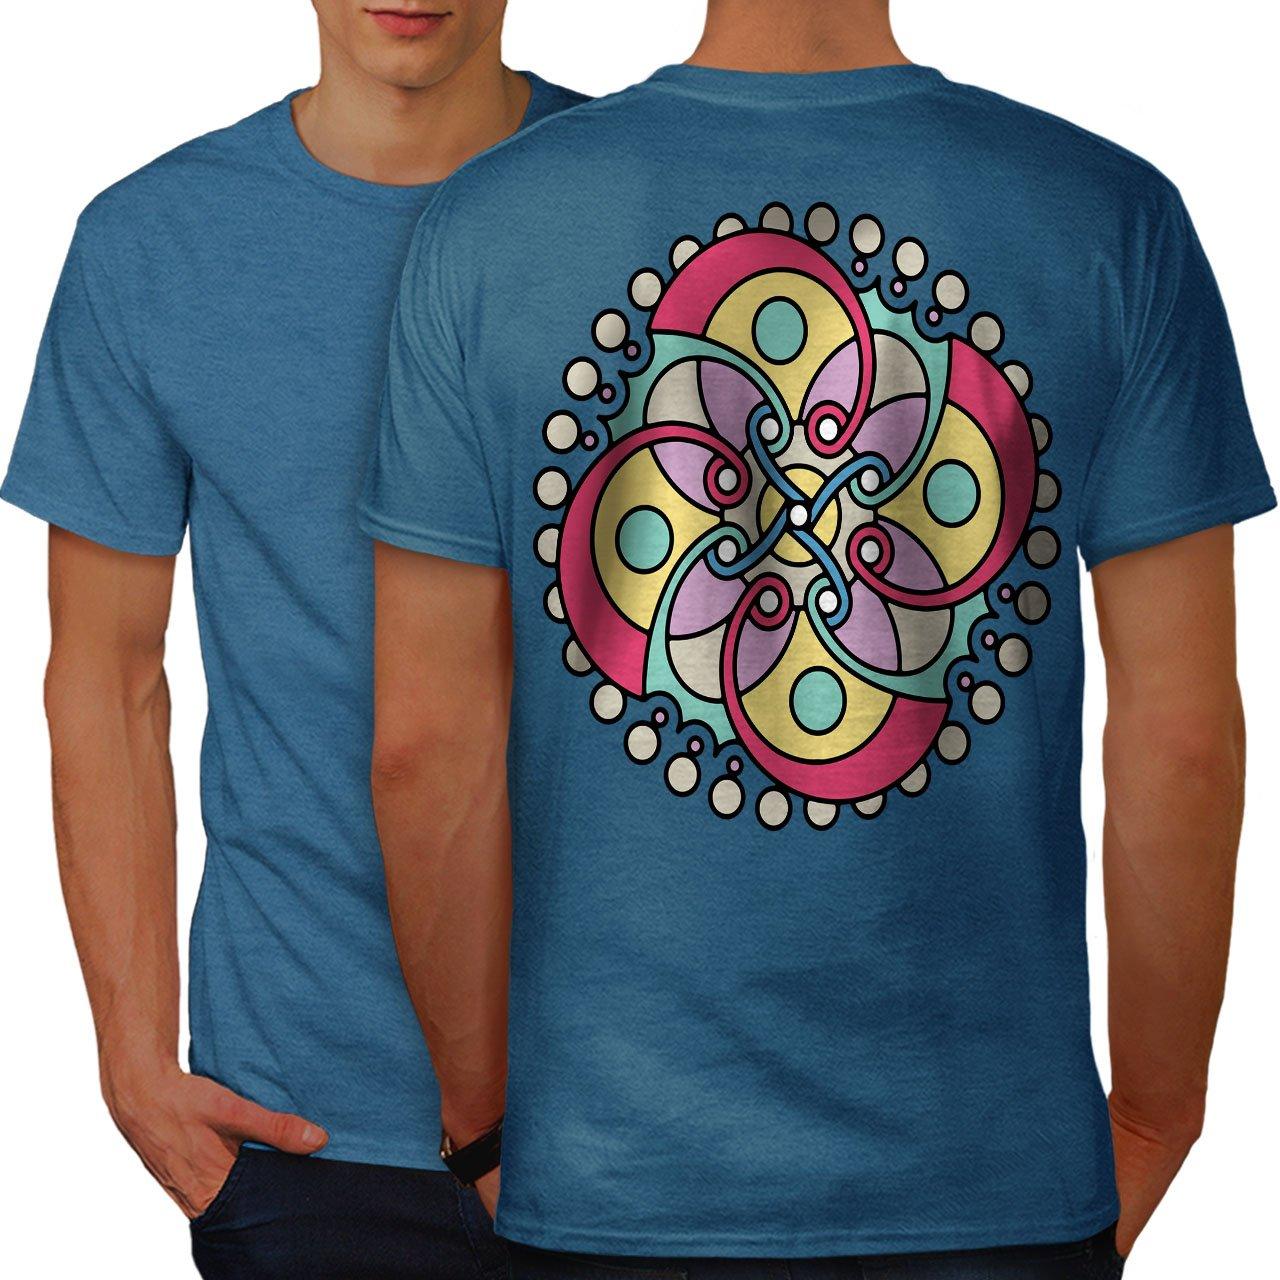 Mandala Spiral S Tshirt Pattern Art Design Print On The Back